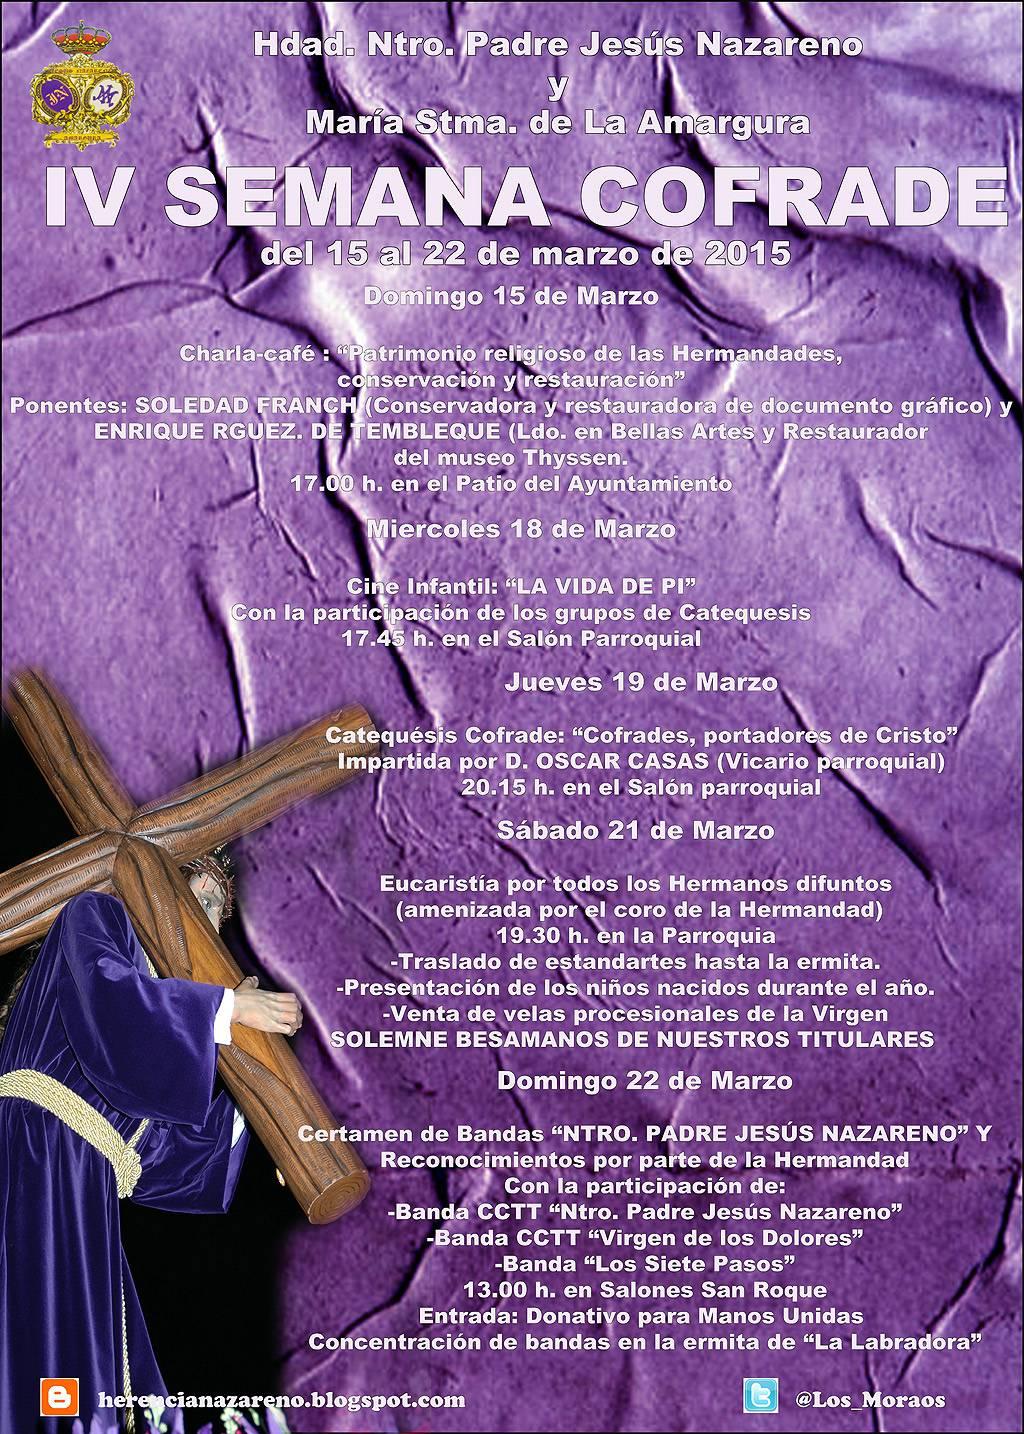 Semana Cofrade Moraos - IV Semana Cofrade de Los Moraos de Herencia